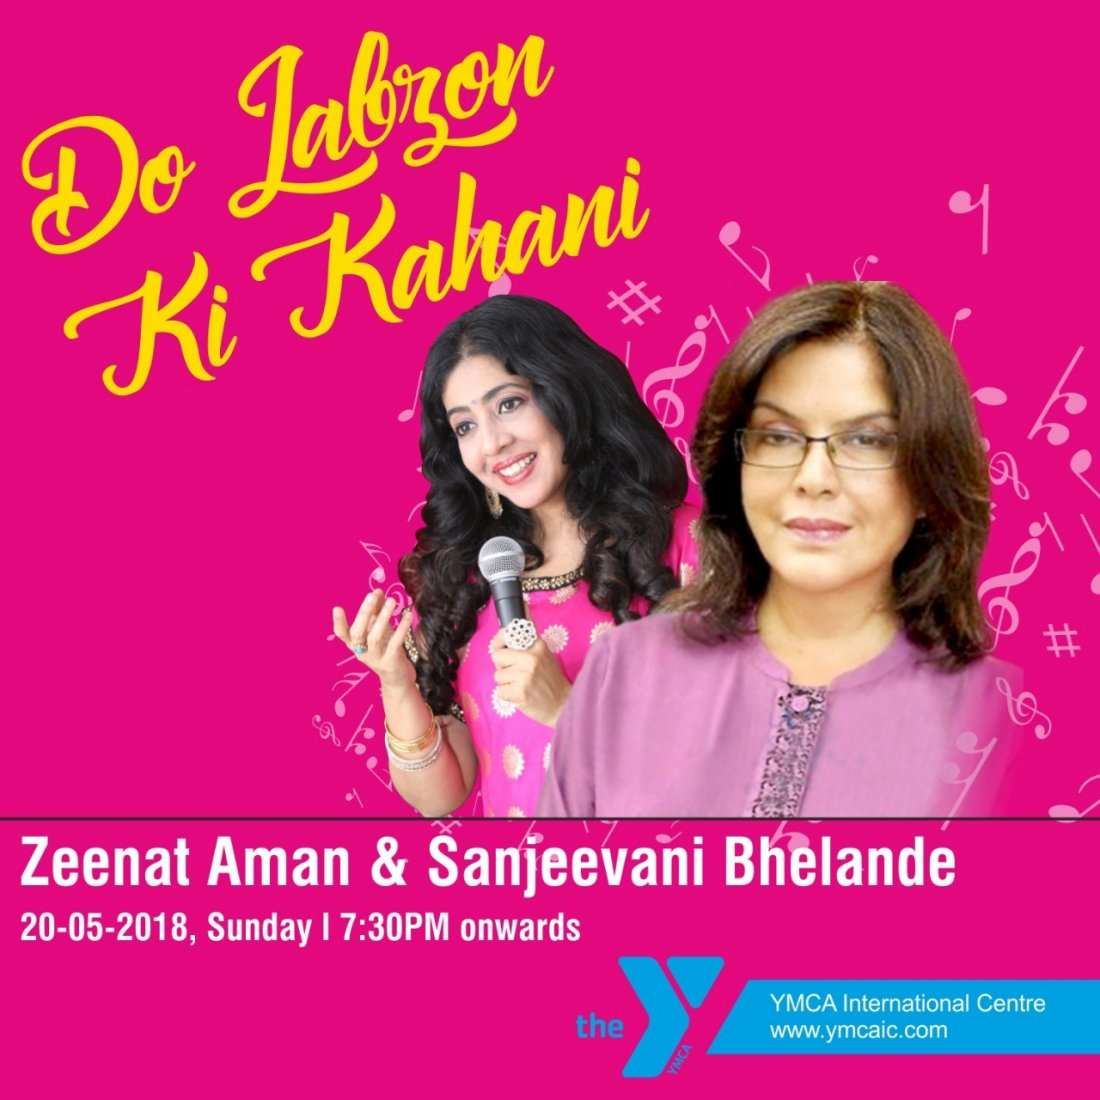 Do Labzon ki Kahani with Zeenath Aman and Sanjeevani Bhelande